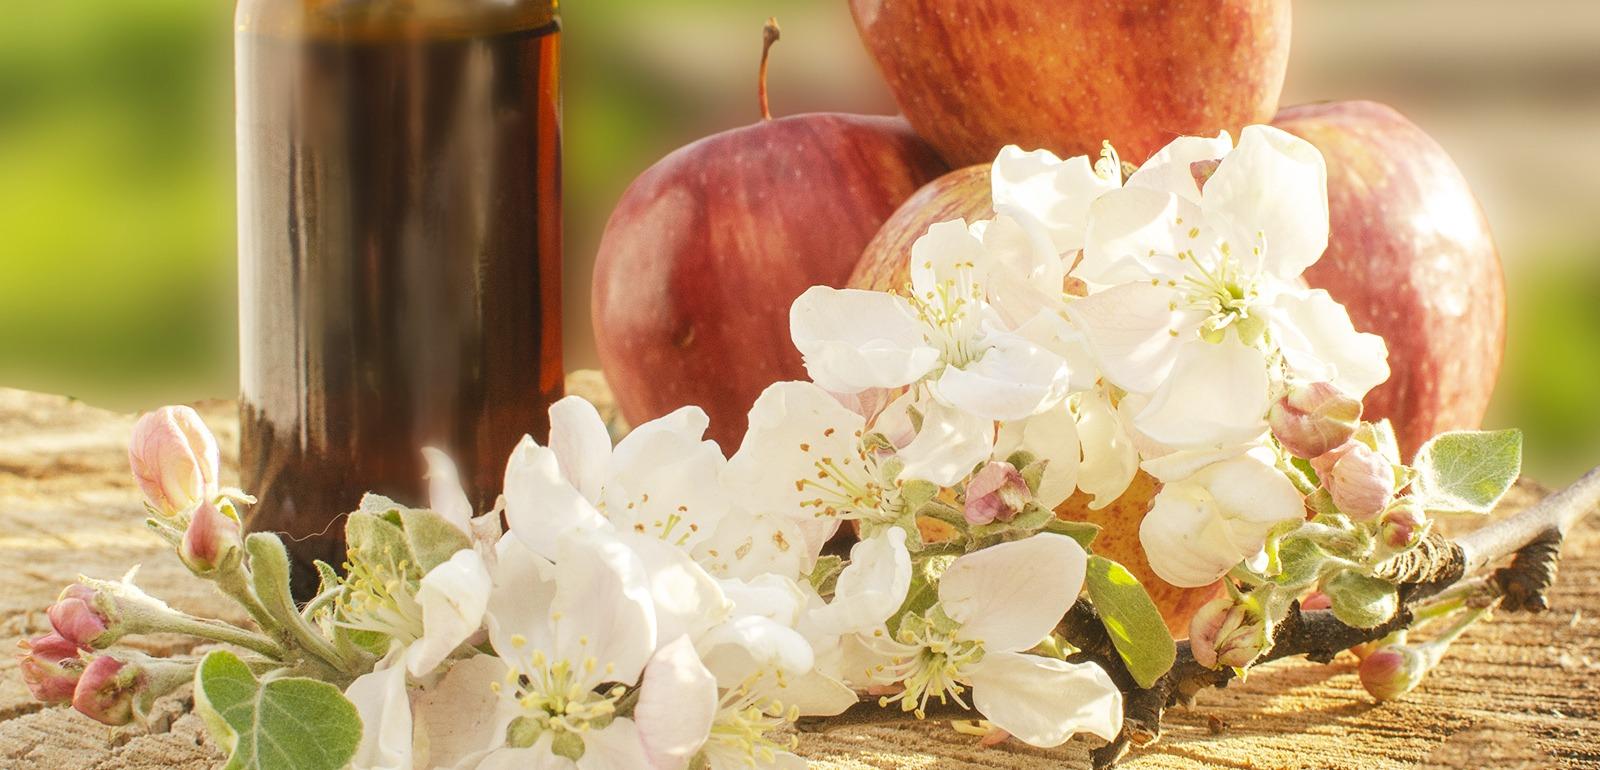 Cosmetiques naturels © malcev852